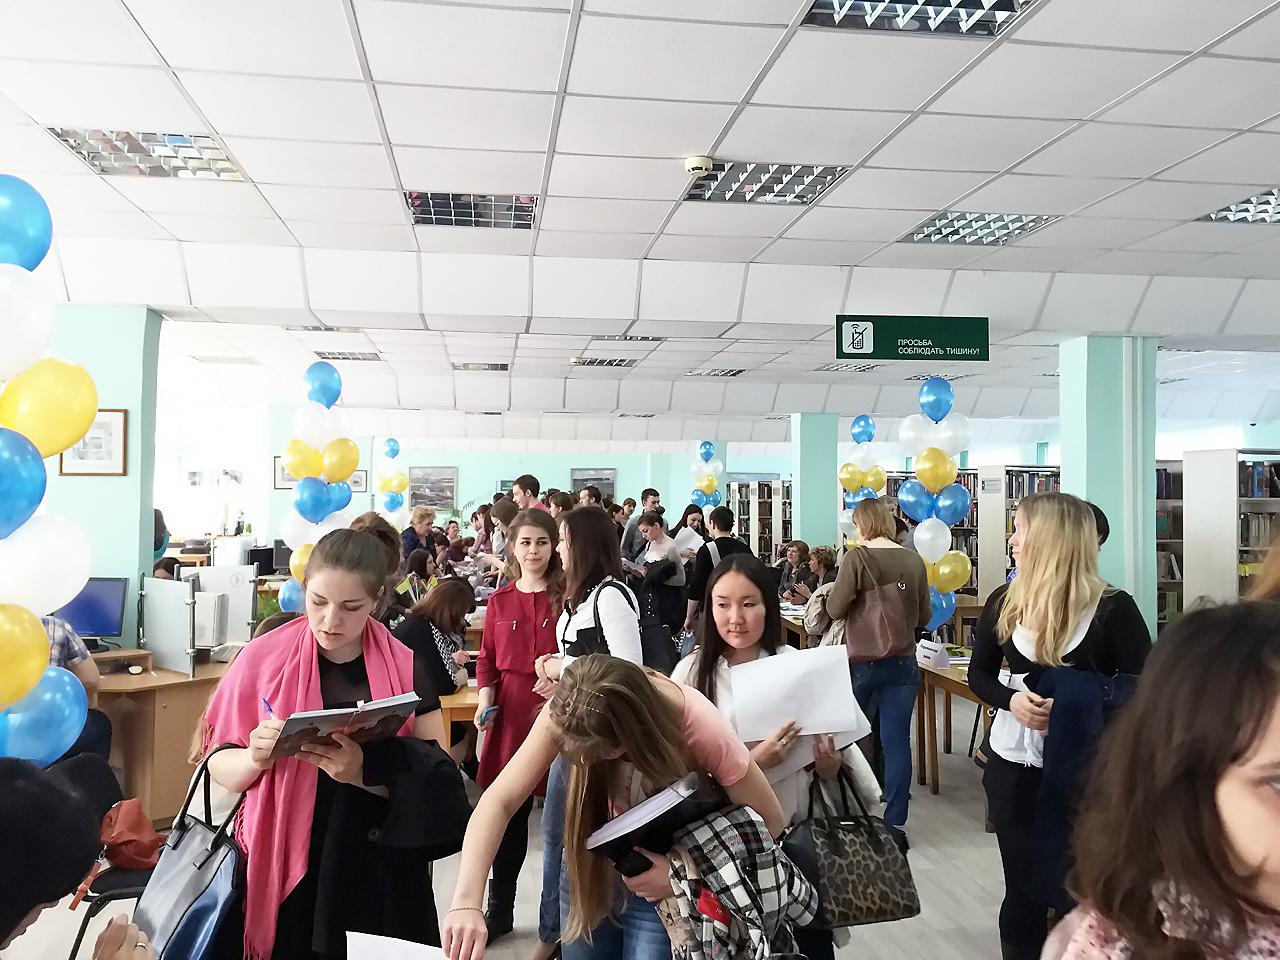 Ярмарка вакансий в НГПУ: более 500 предложений